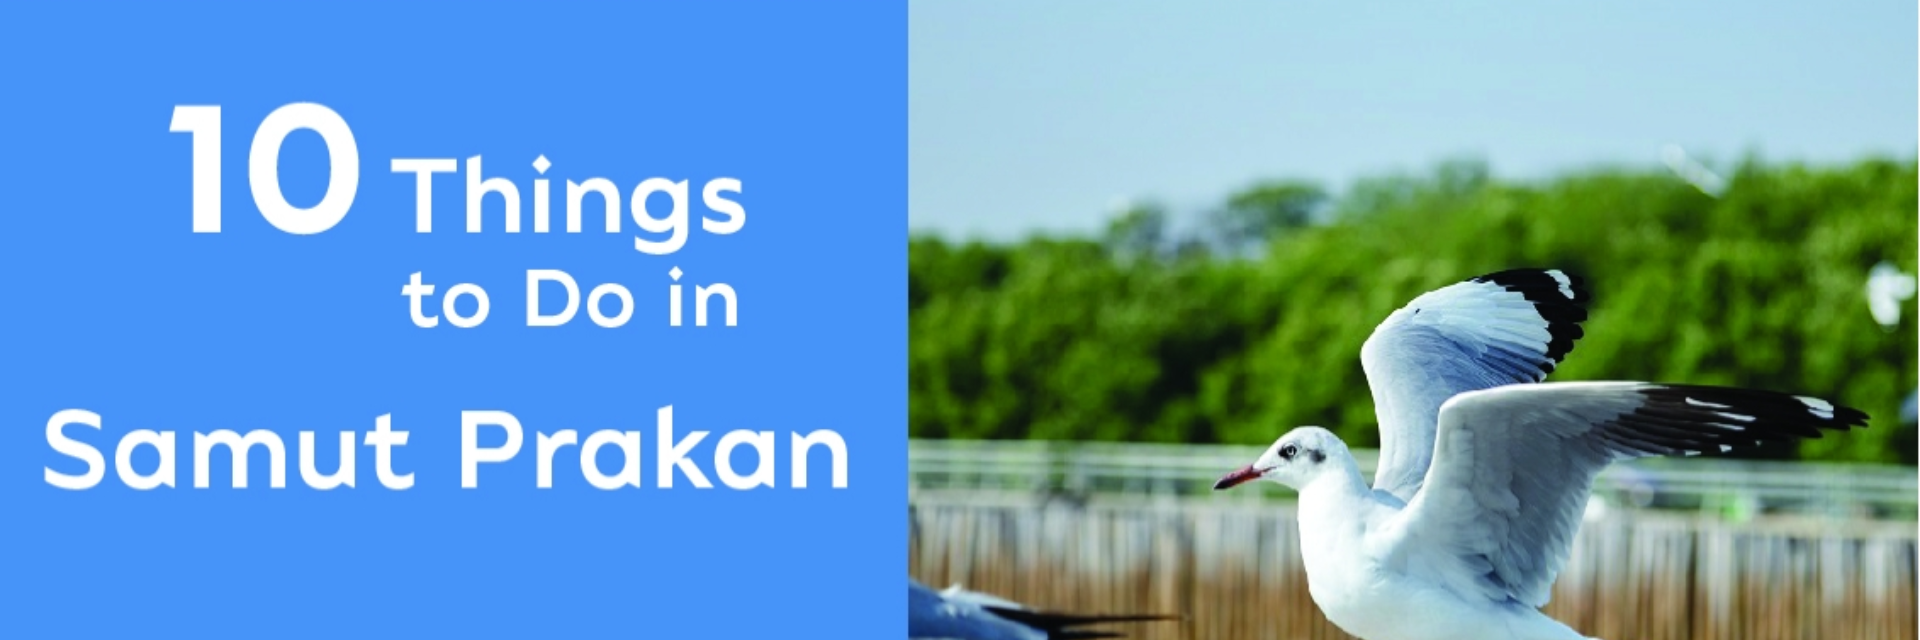 10 THINGS TO DO IN SAMUT PRAKAN